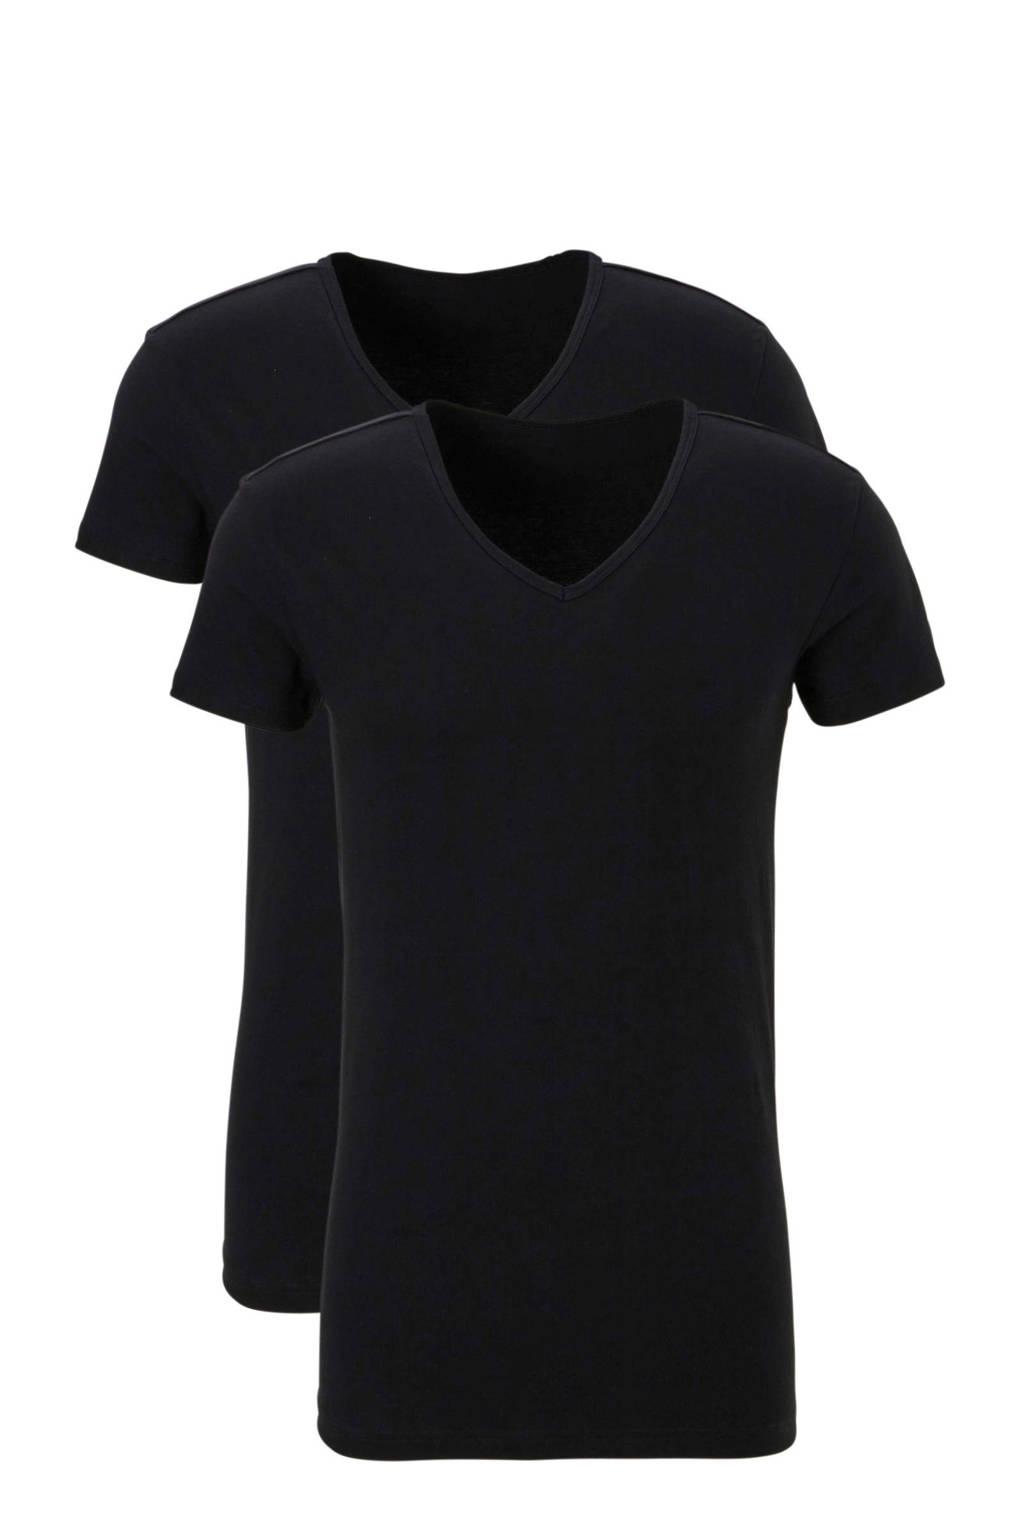 ten Cate T-shirt (set van 2) zwart, Zwart